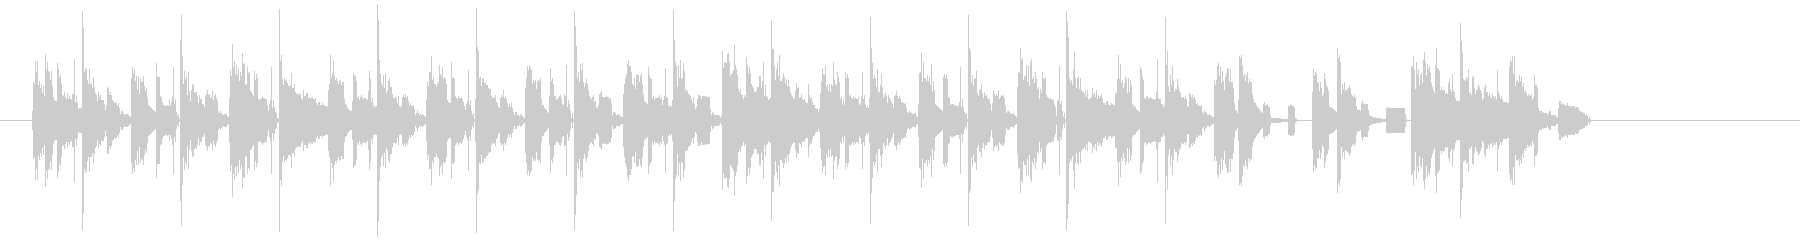 8bitのコミカルなジングルの未再生の波形